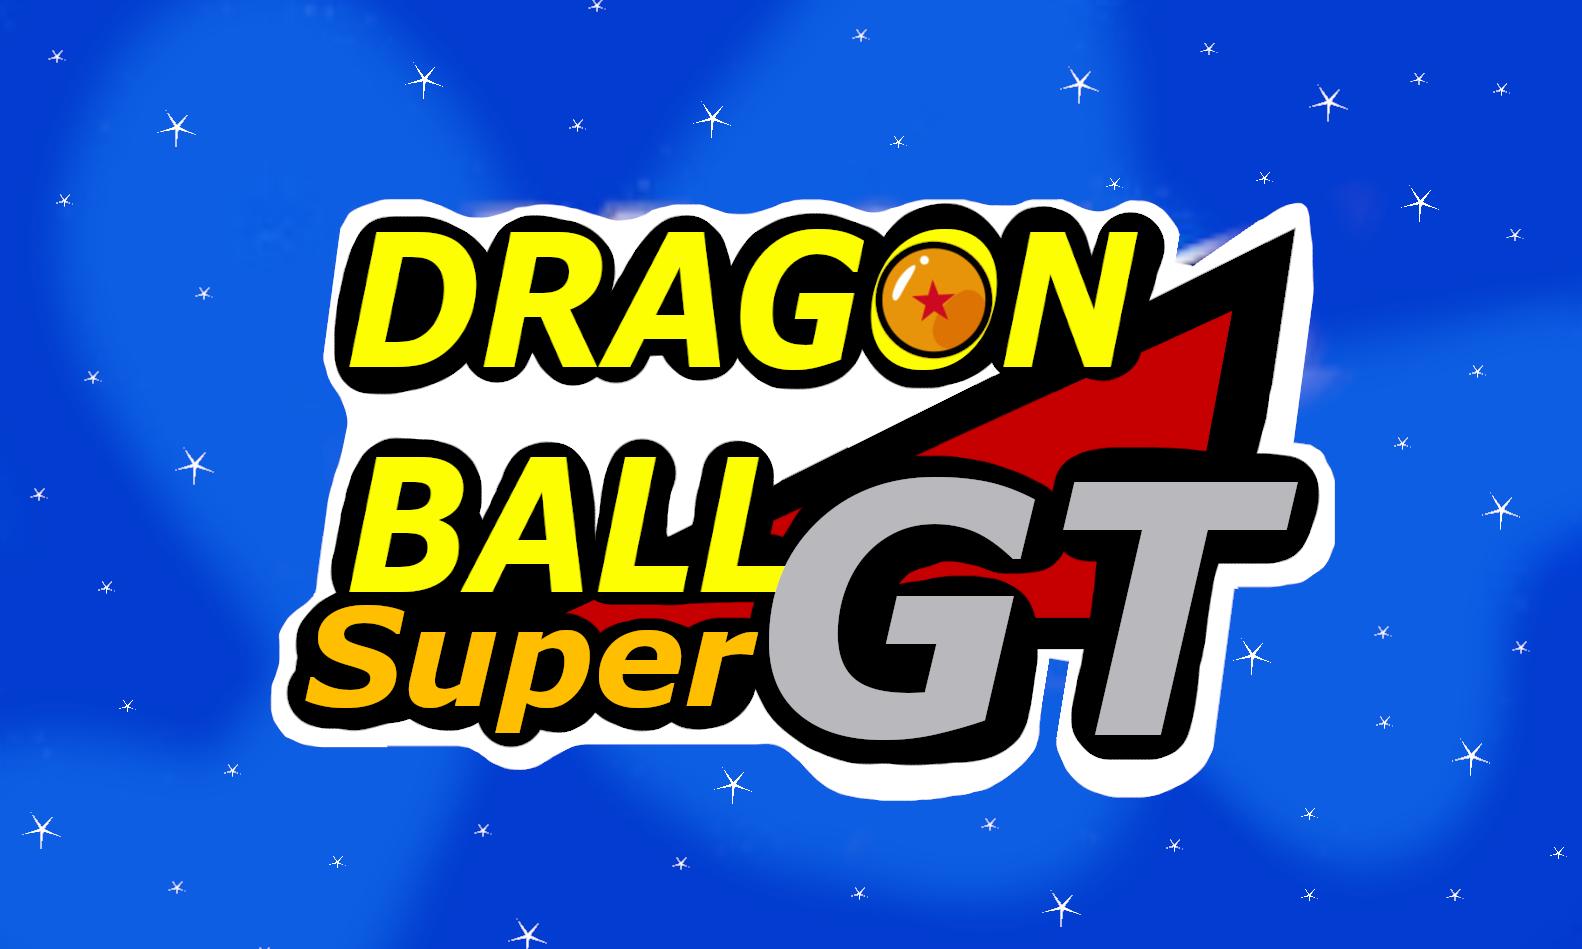 Dragon Ball Super GT